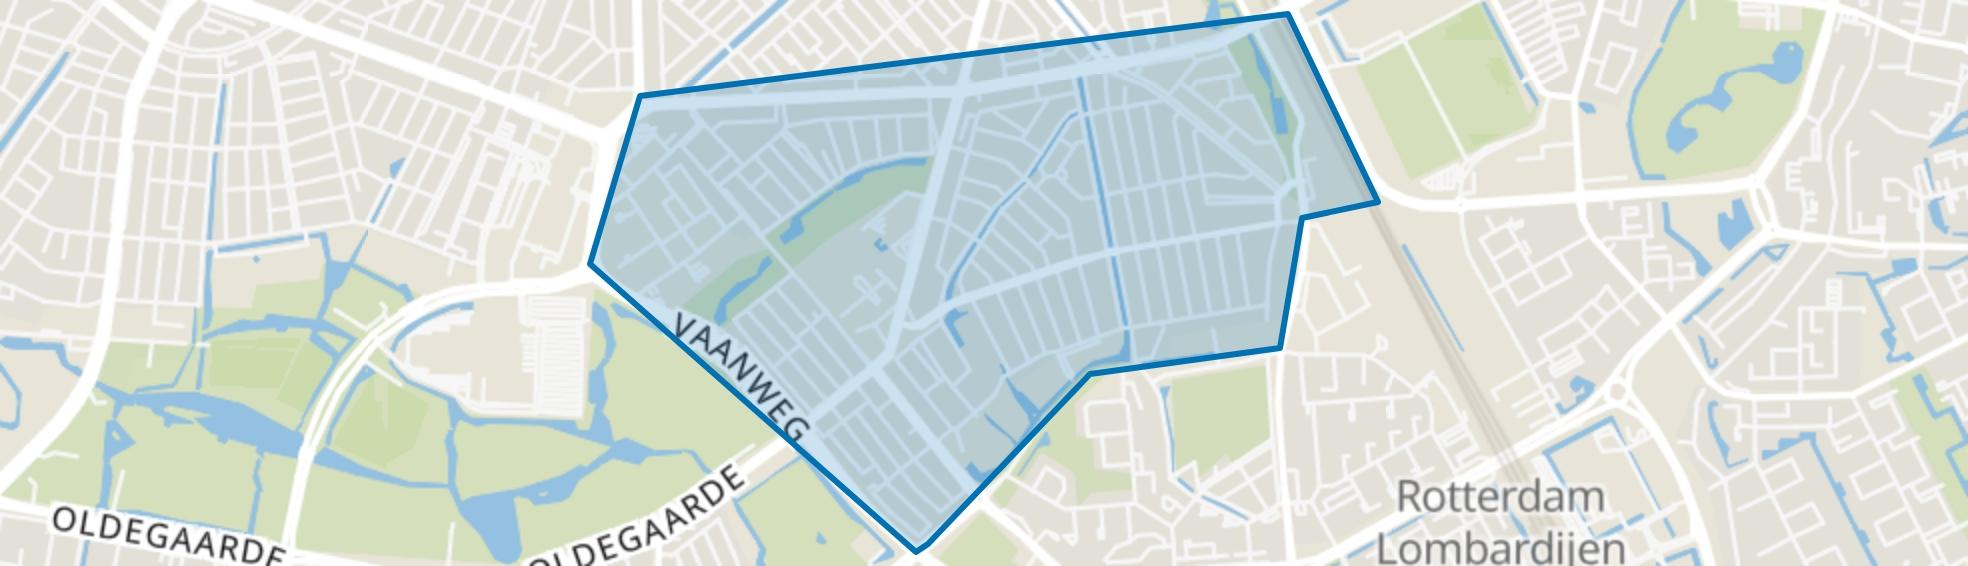 Vreewijk, Rotterdam map